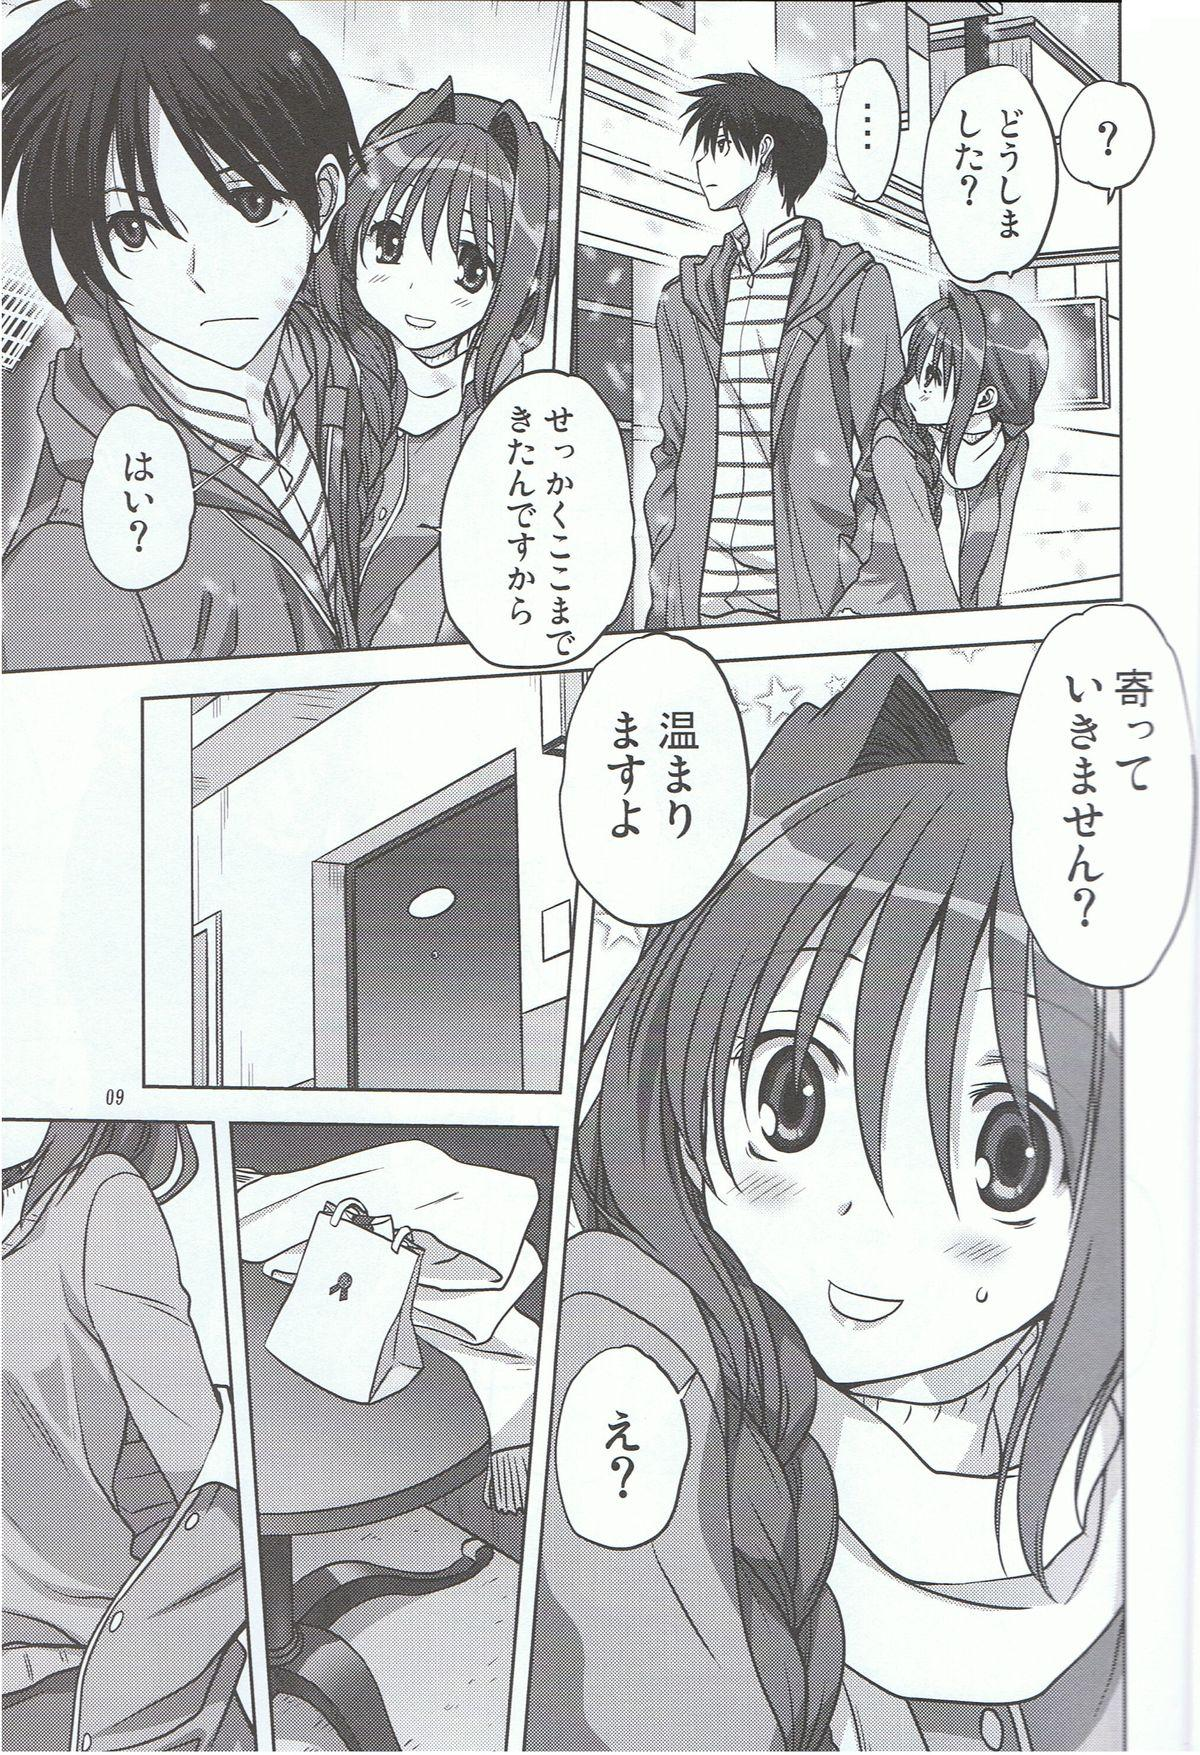 Akiko-san to Issho 13 7